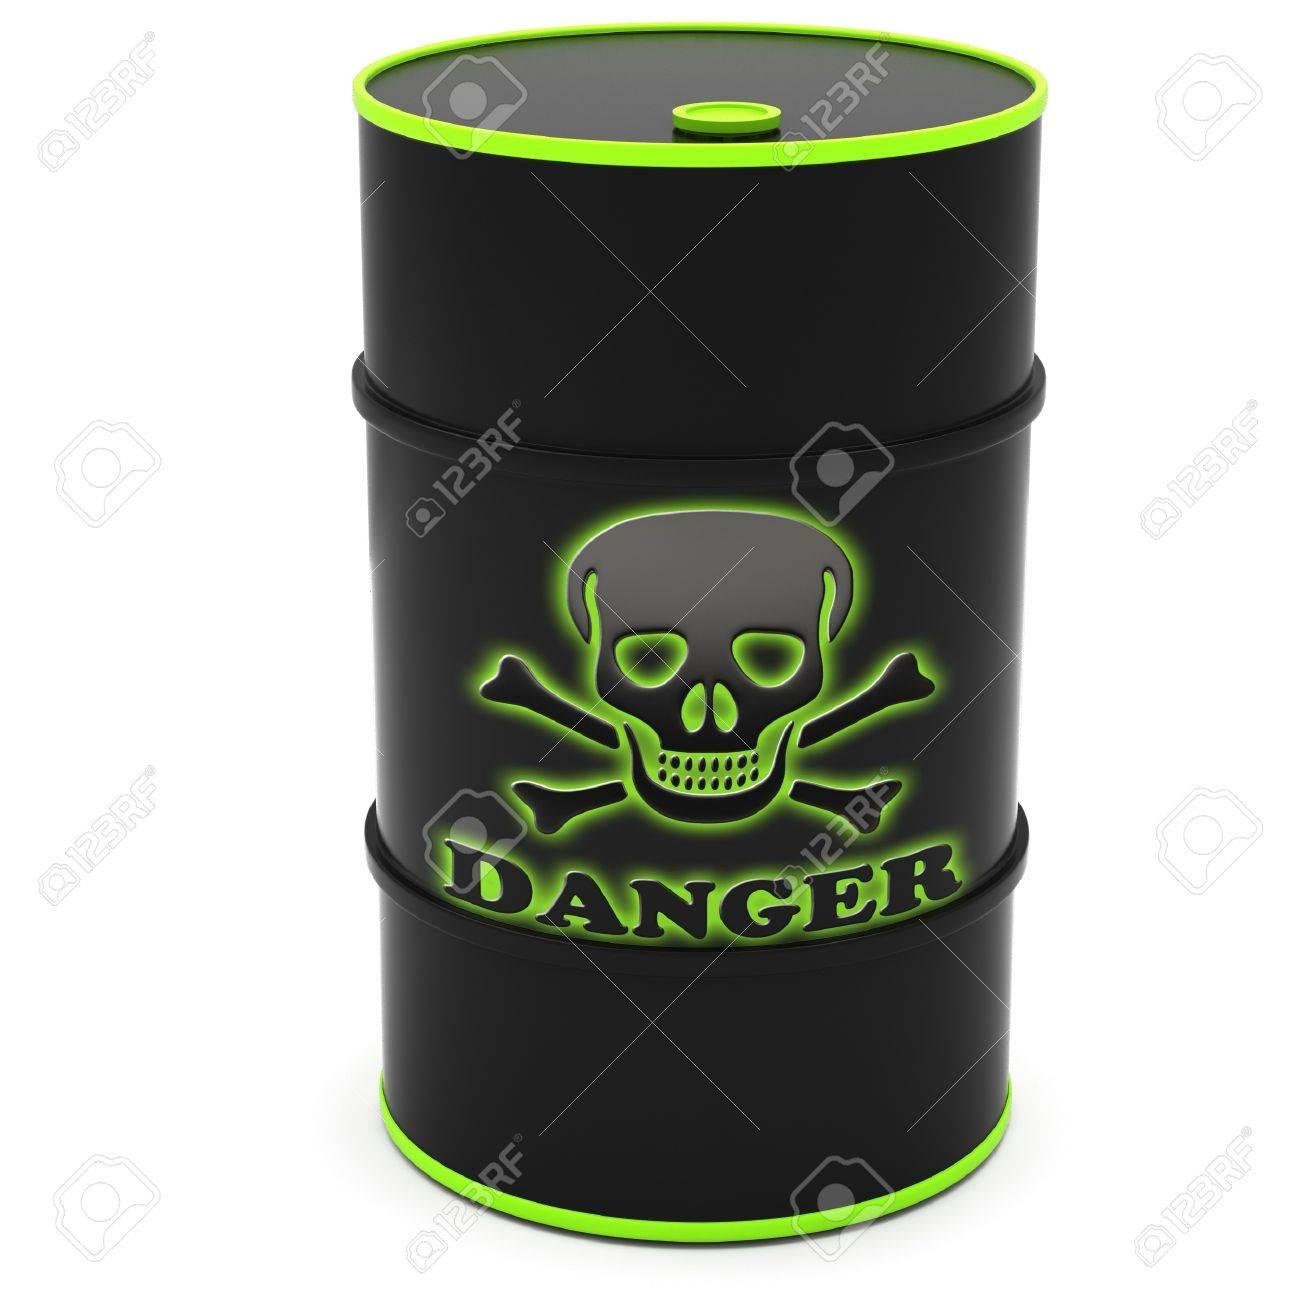 Barrels for storage of hazardous substances on a white background. Stock Photo - 12313337